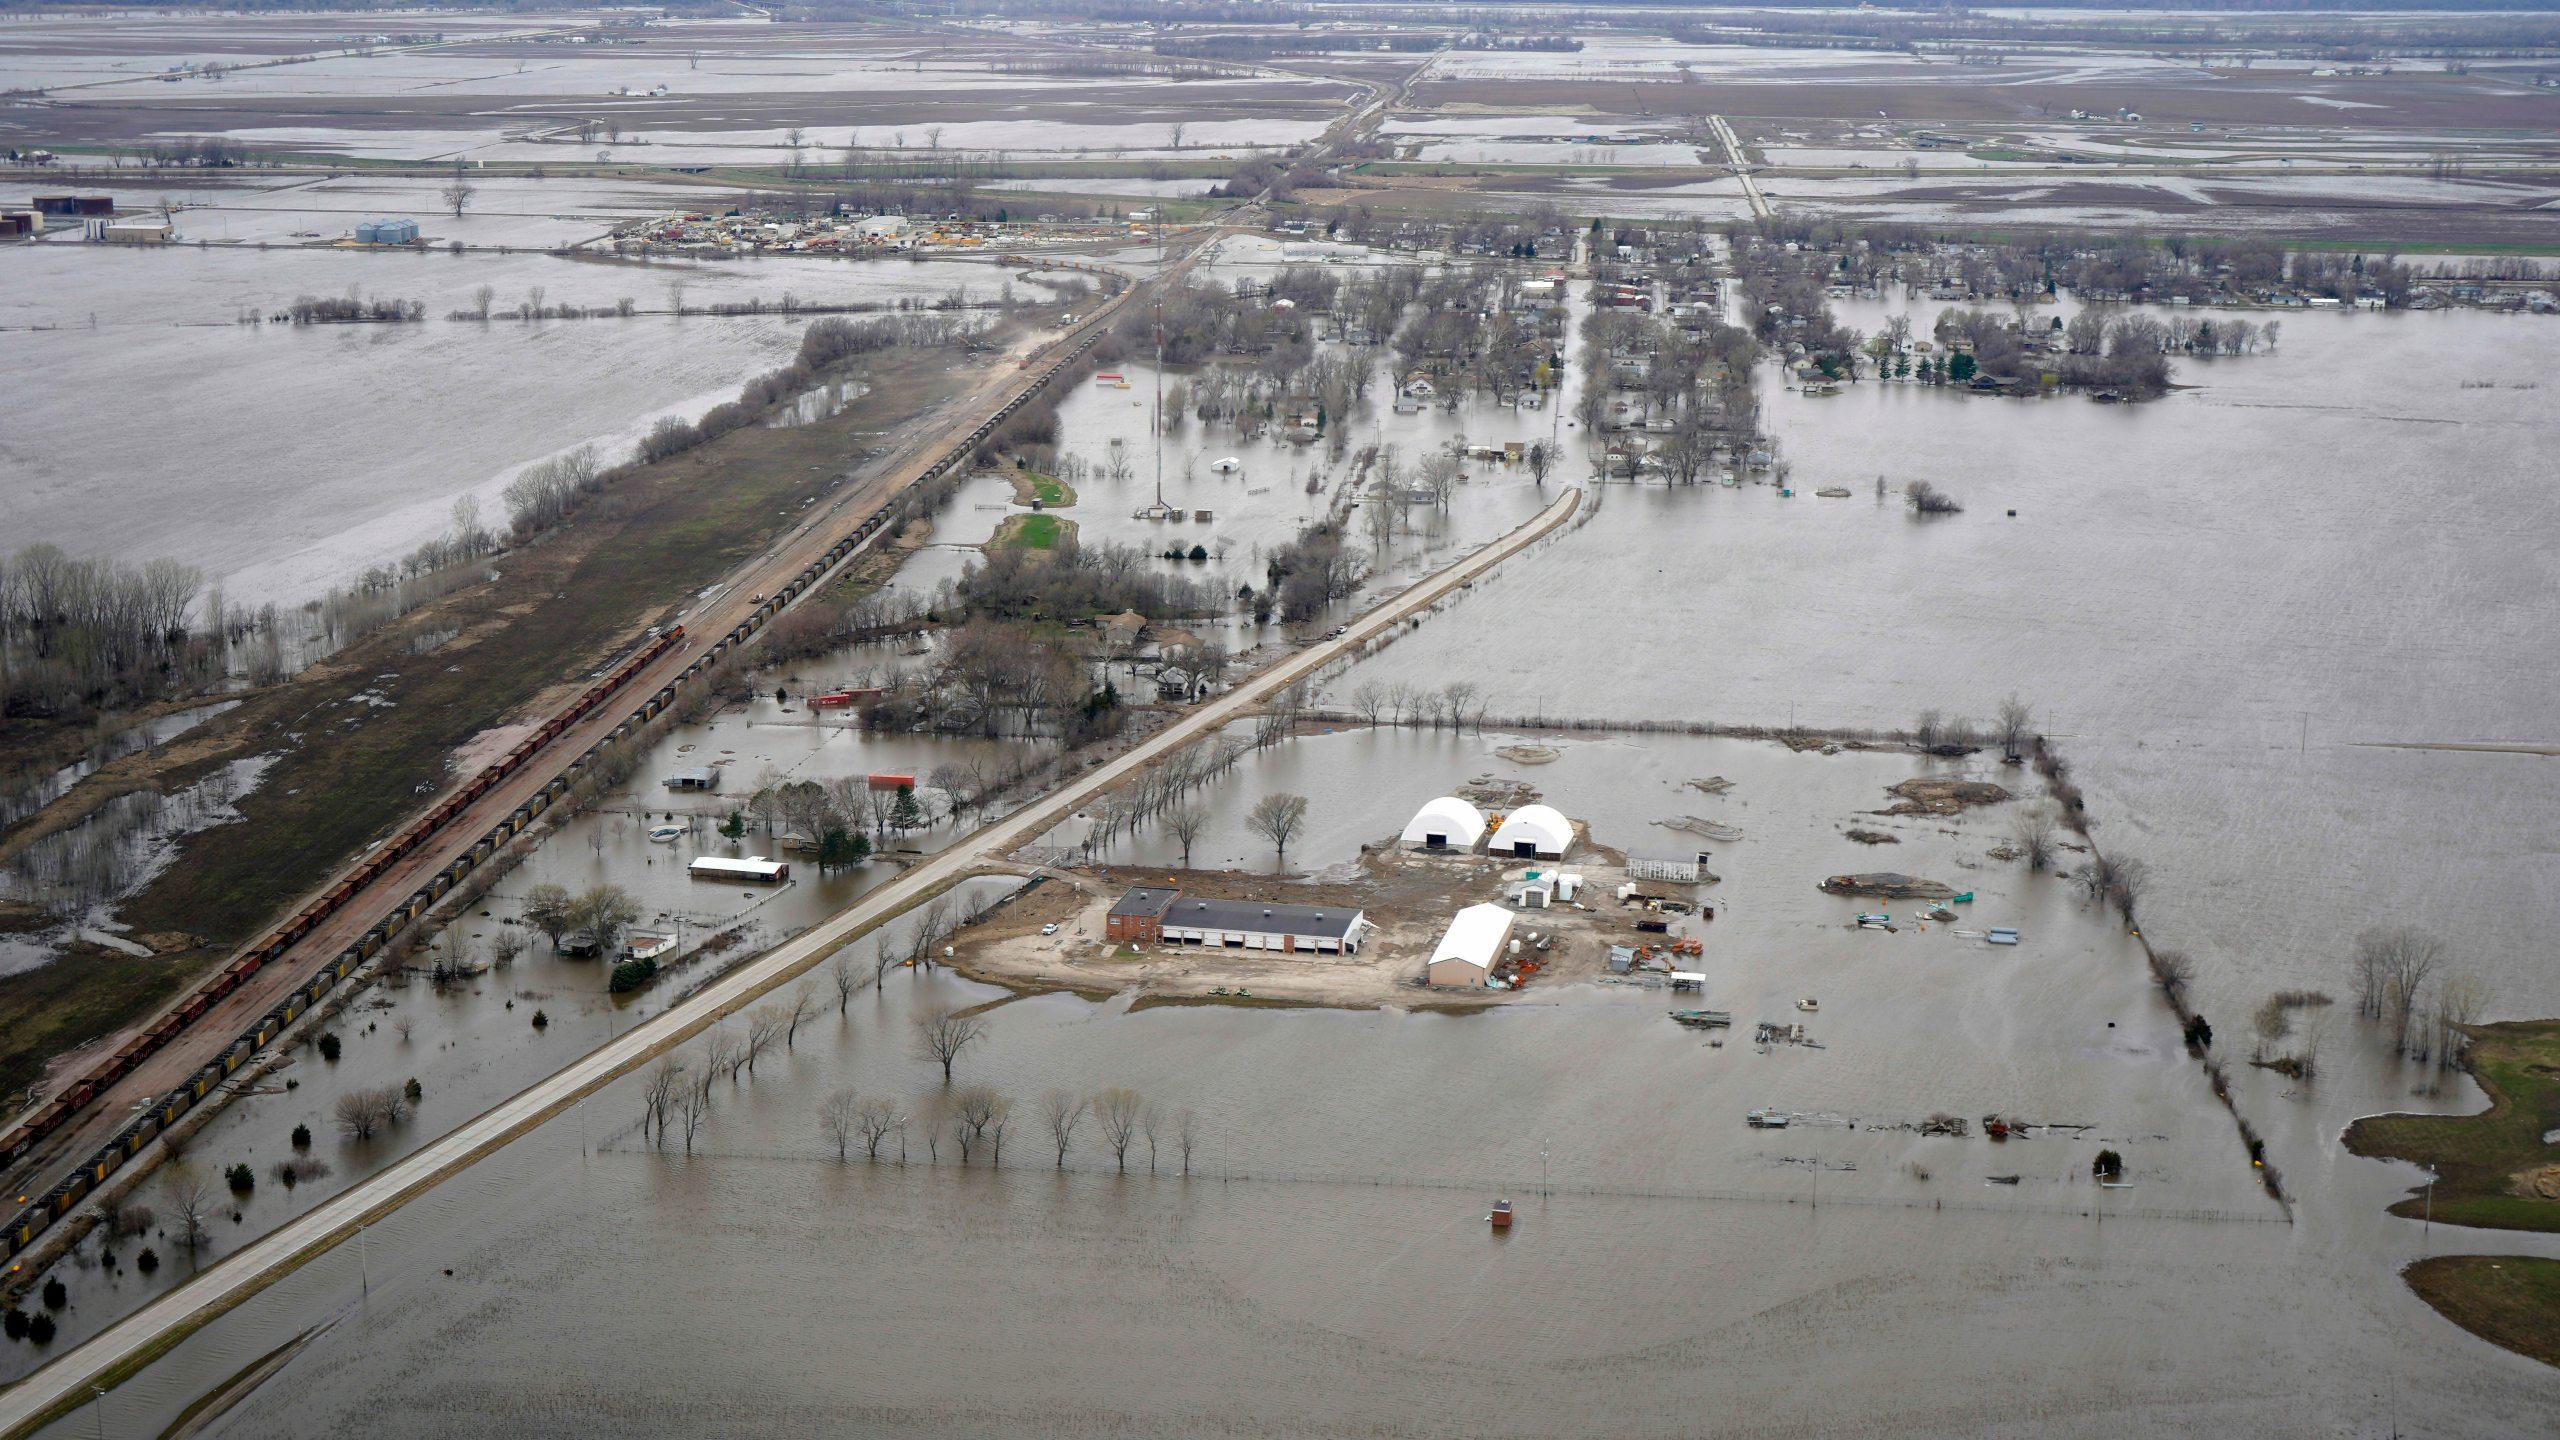 Spring_Flooding_Corps_36898-159532.jpg08466540